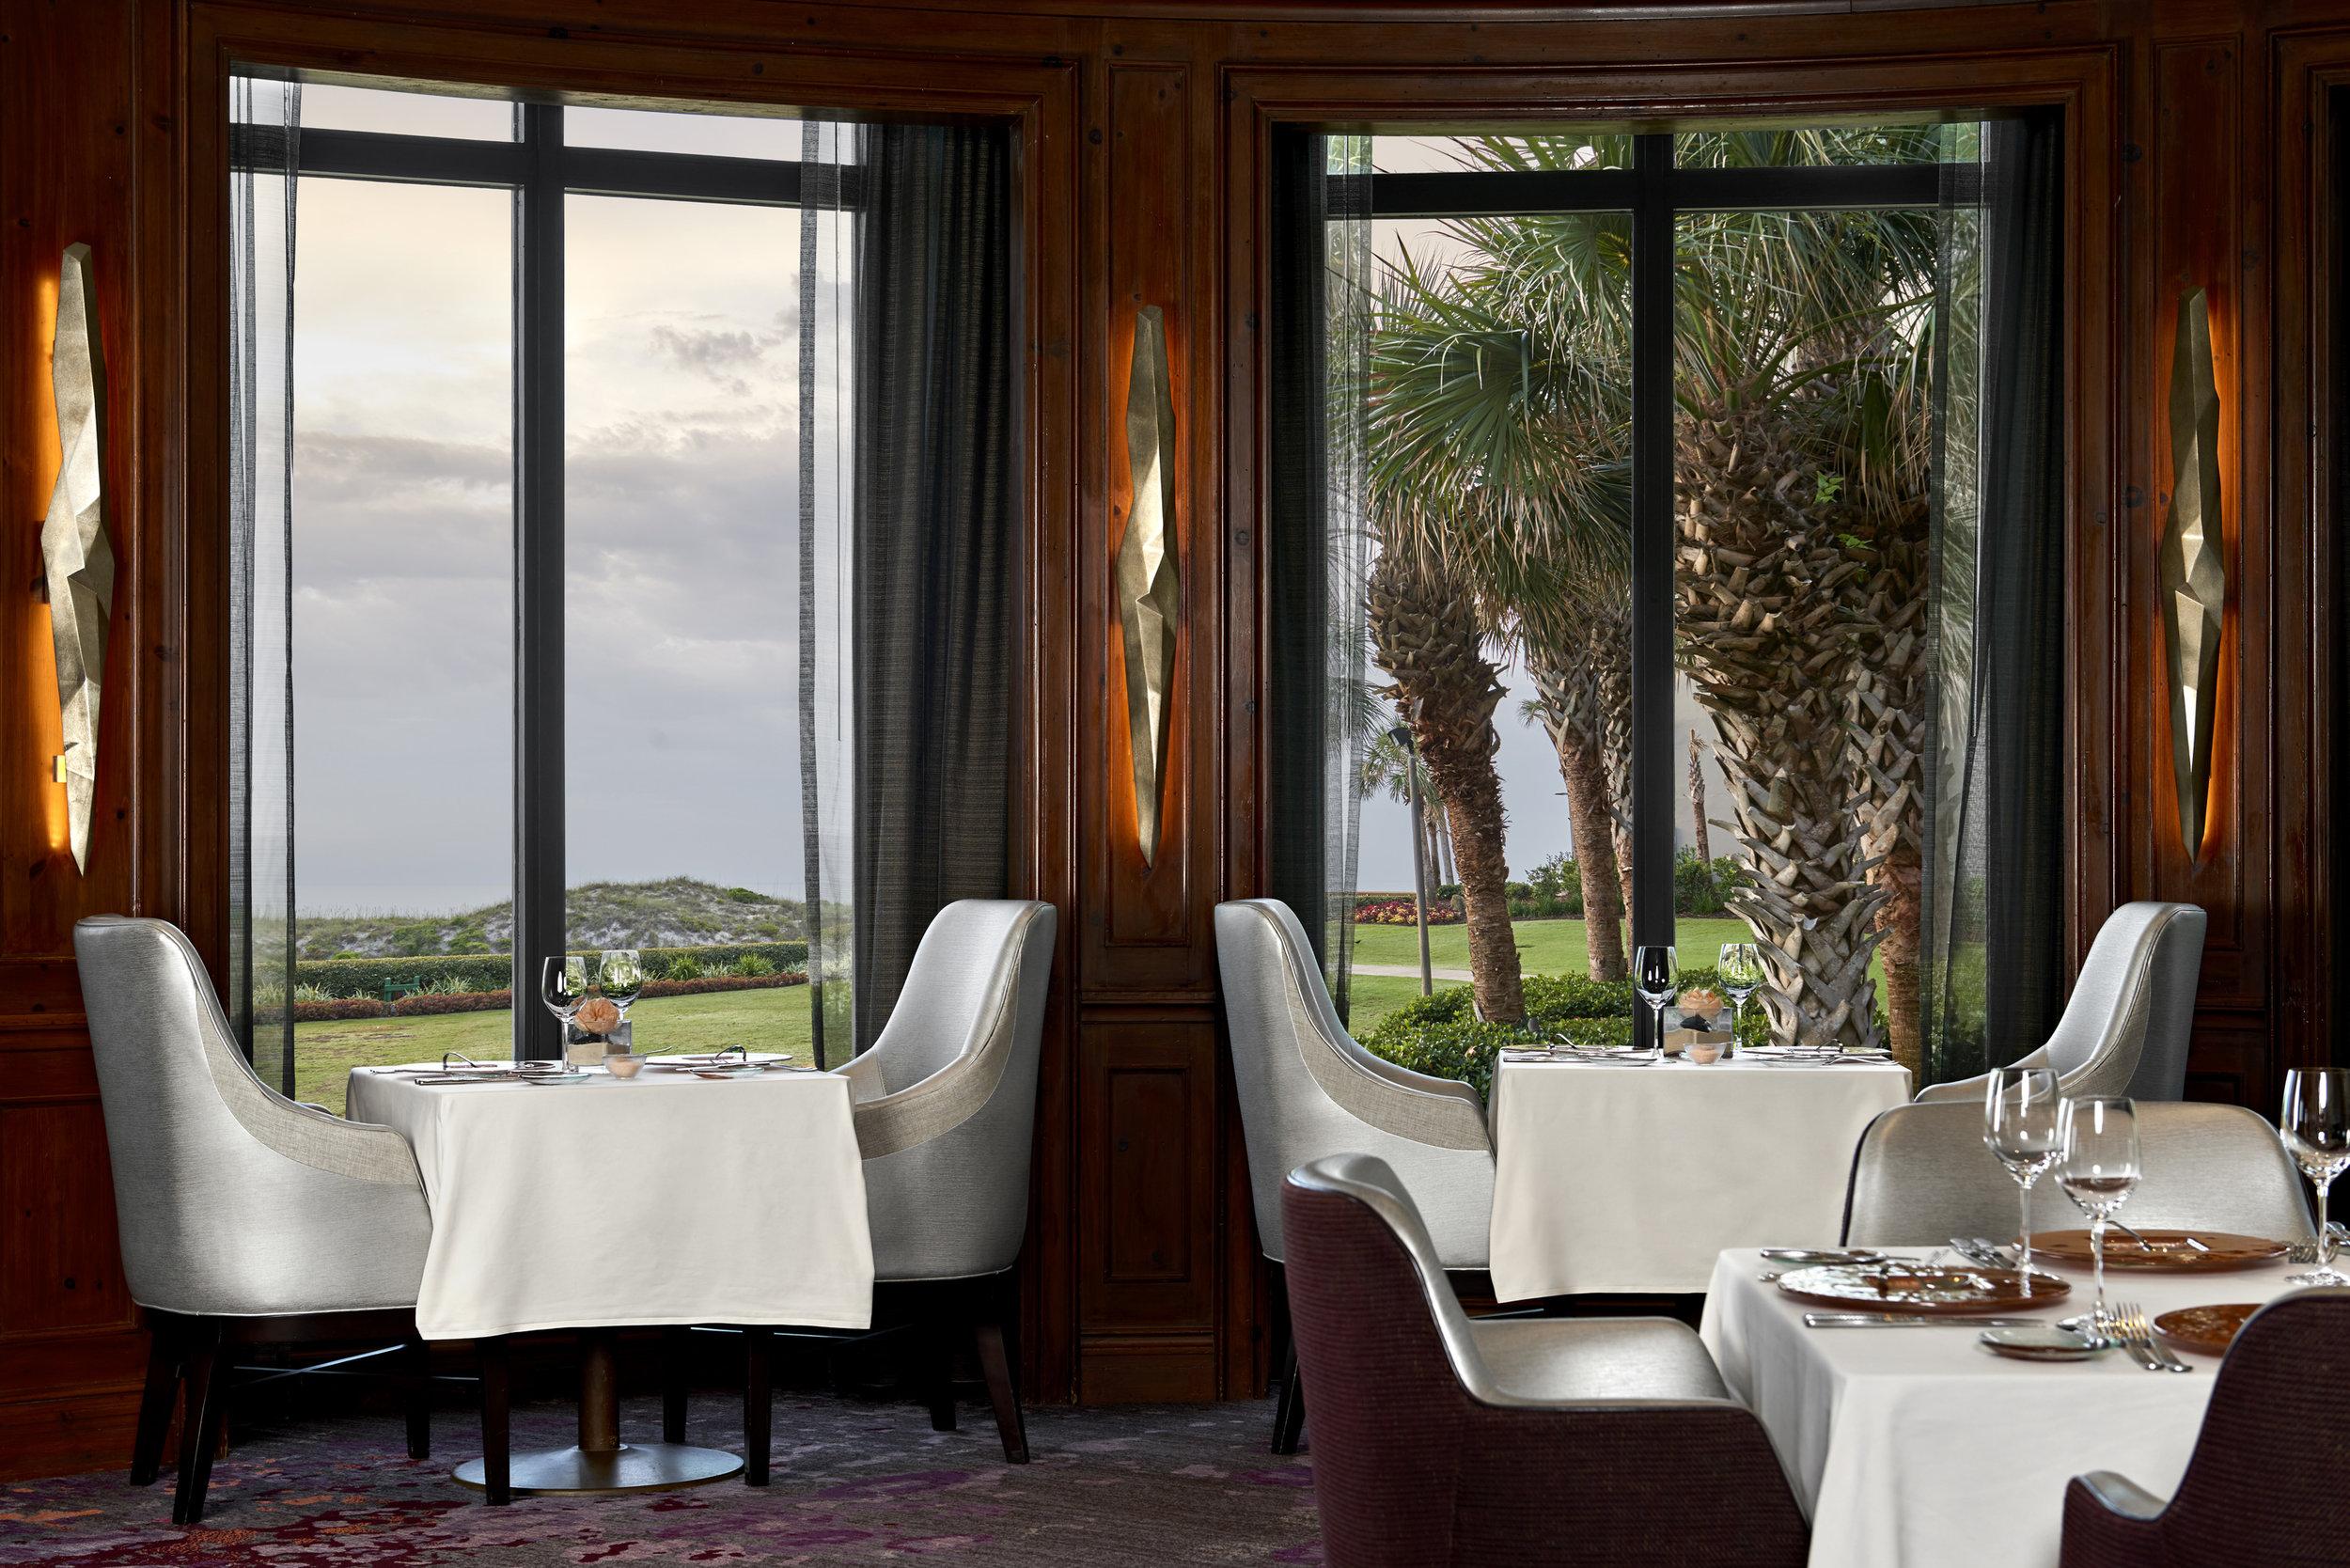 Ritz-Carlton-Amelia-Island-Shot-23-LR.jpg